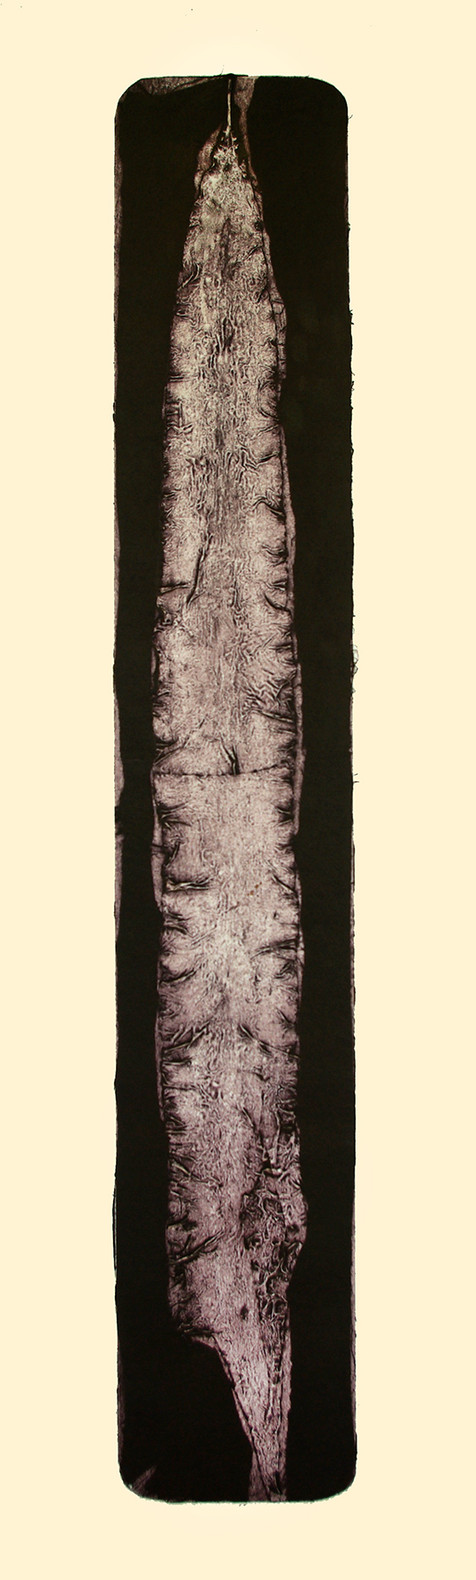 Jane Sampson 'Seaweed' Collagraph 38 x 1120cm edn. 10